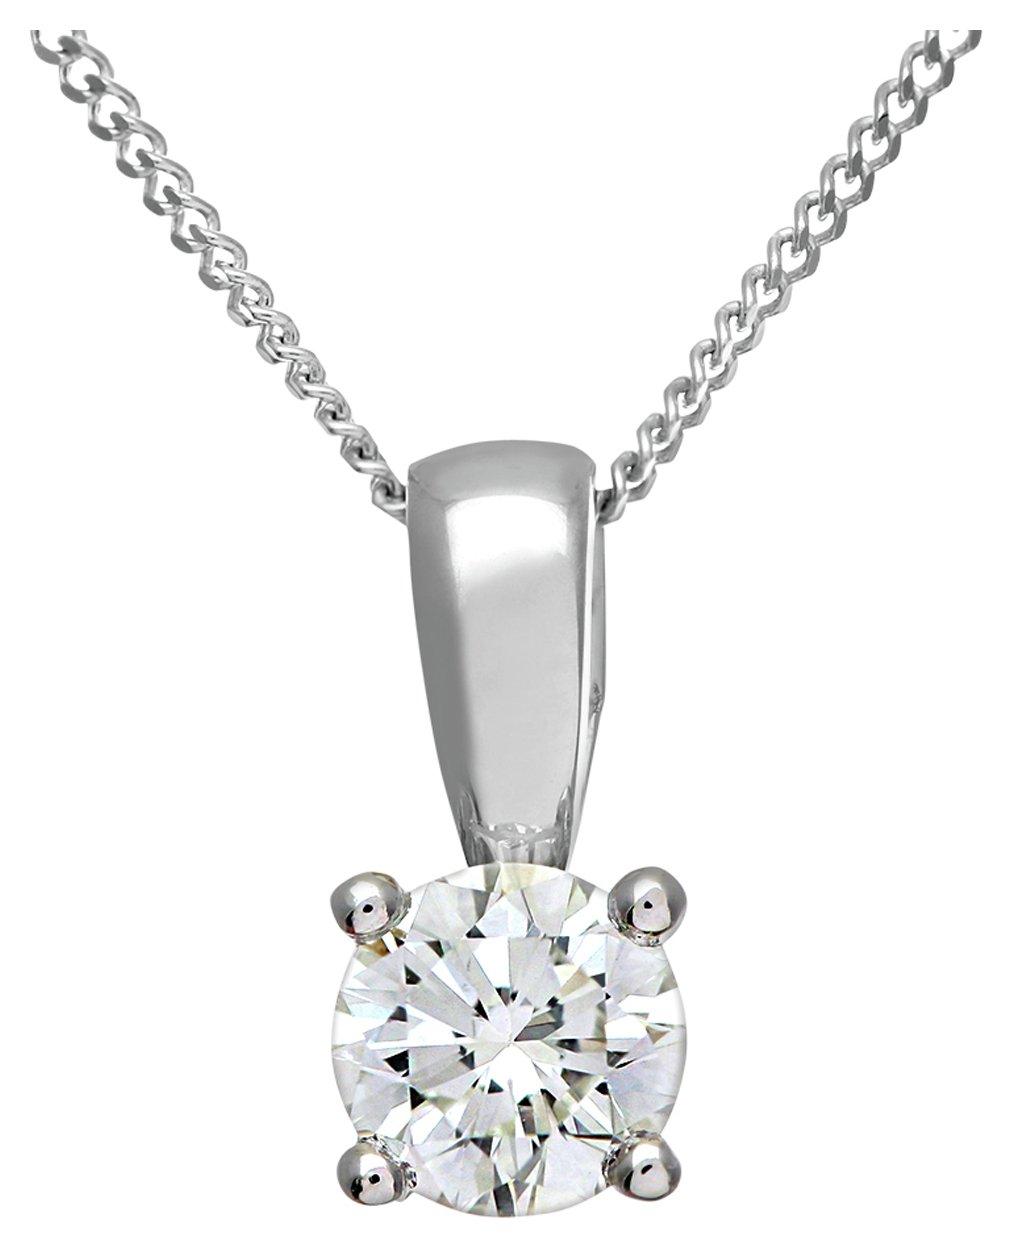 Image of Everlasting Love - 18 Carat W Gold - 0.50 Carat Diamond Pendant Necklace